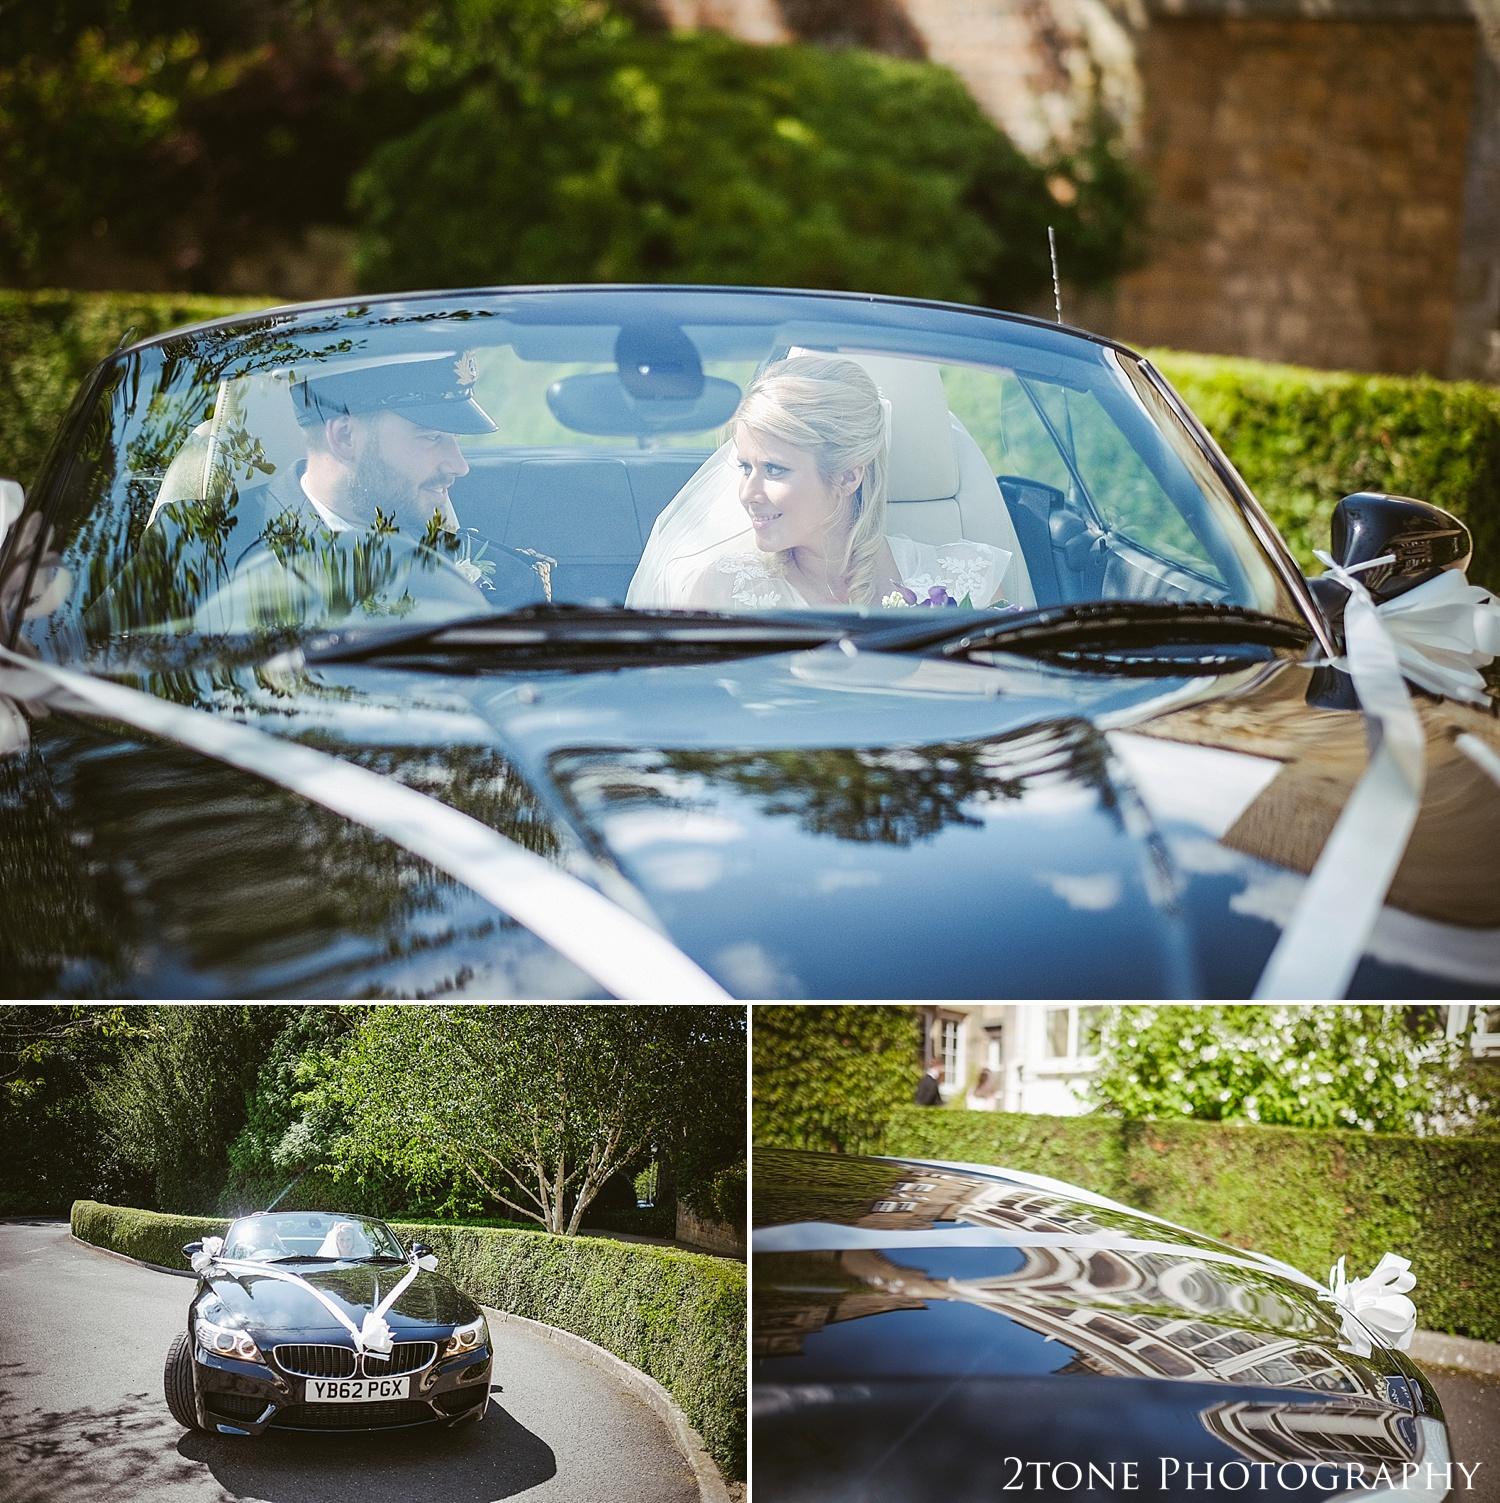 Wedding car in Northumberland.  Wedding photography at Matfen Hall by wedding photographer www.2tonephotography.co.uk